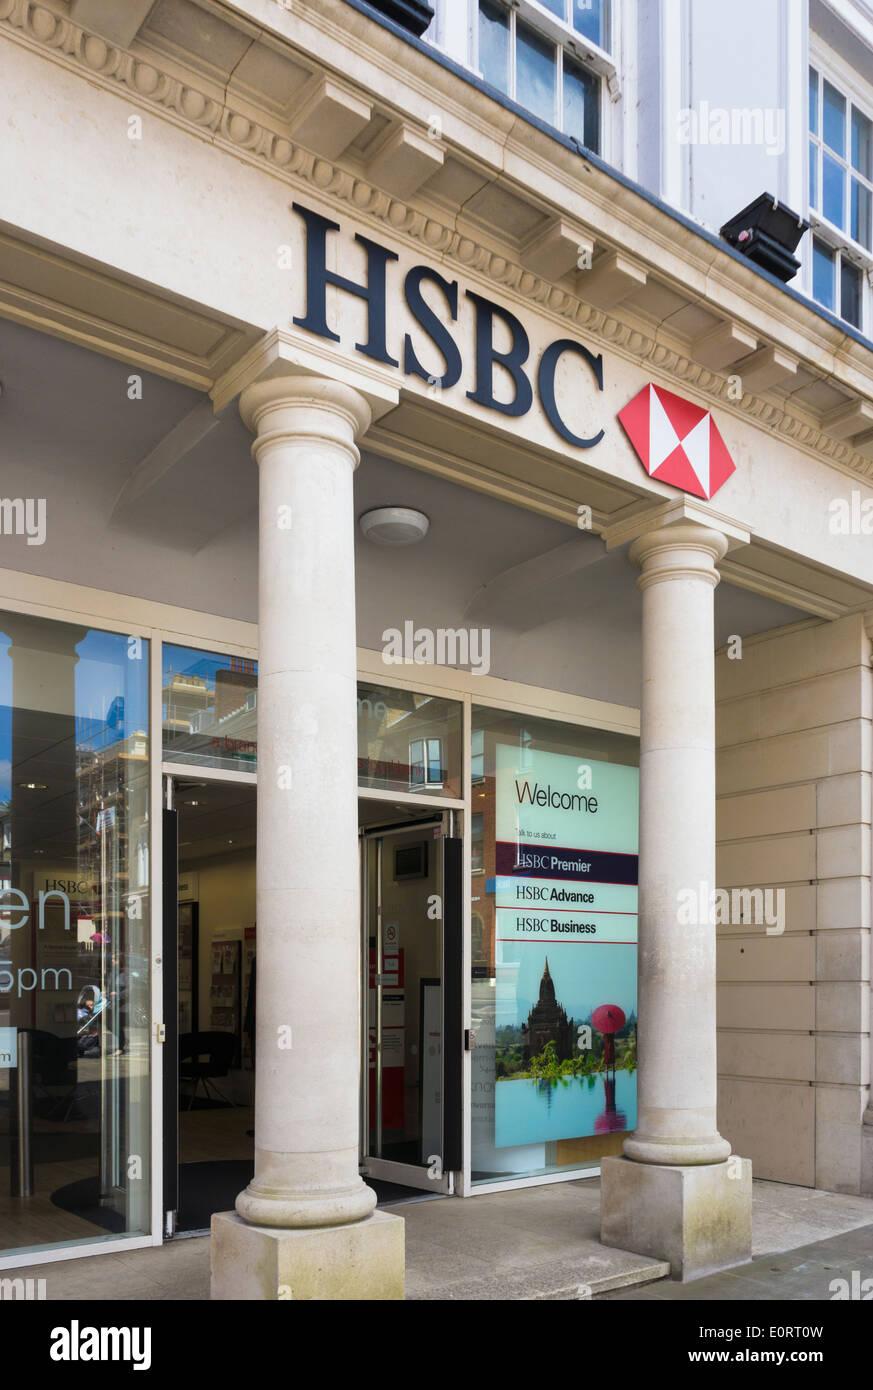 La banque HSBC, England, UK Photo Stock